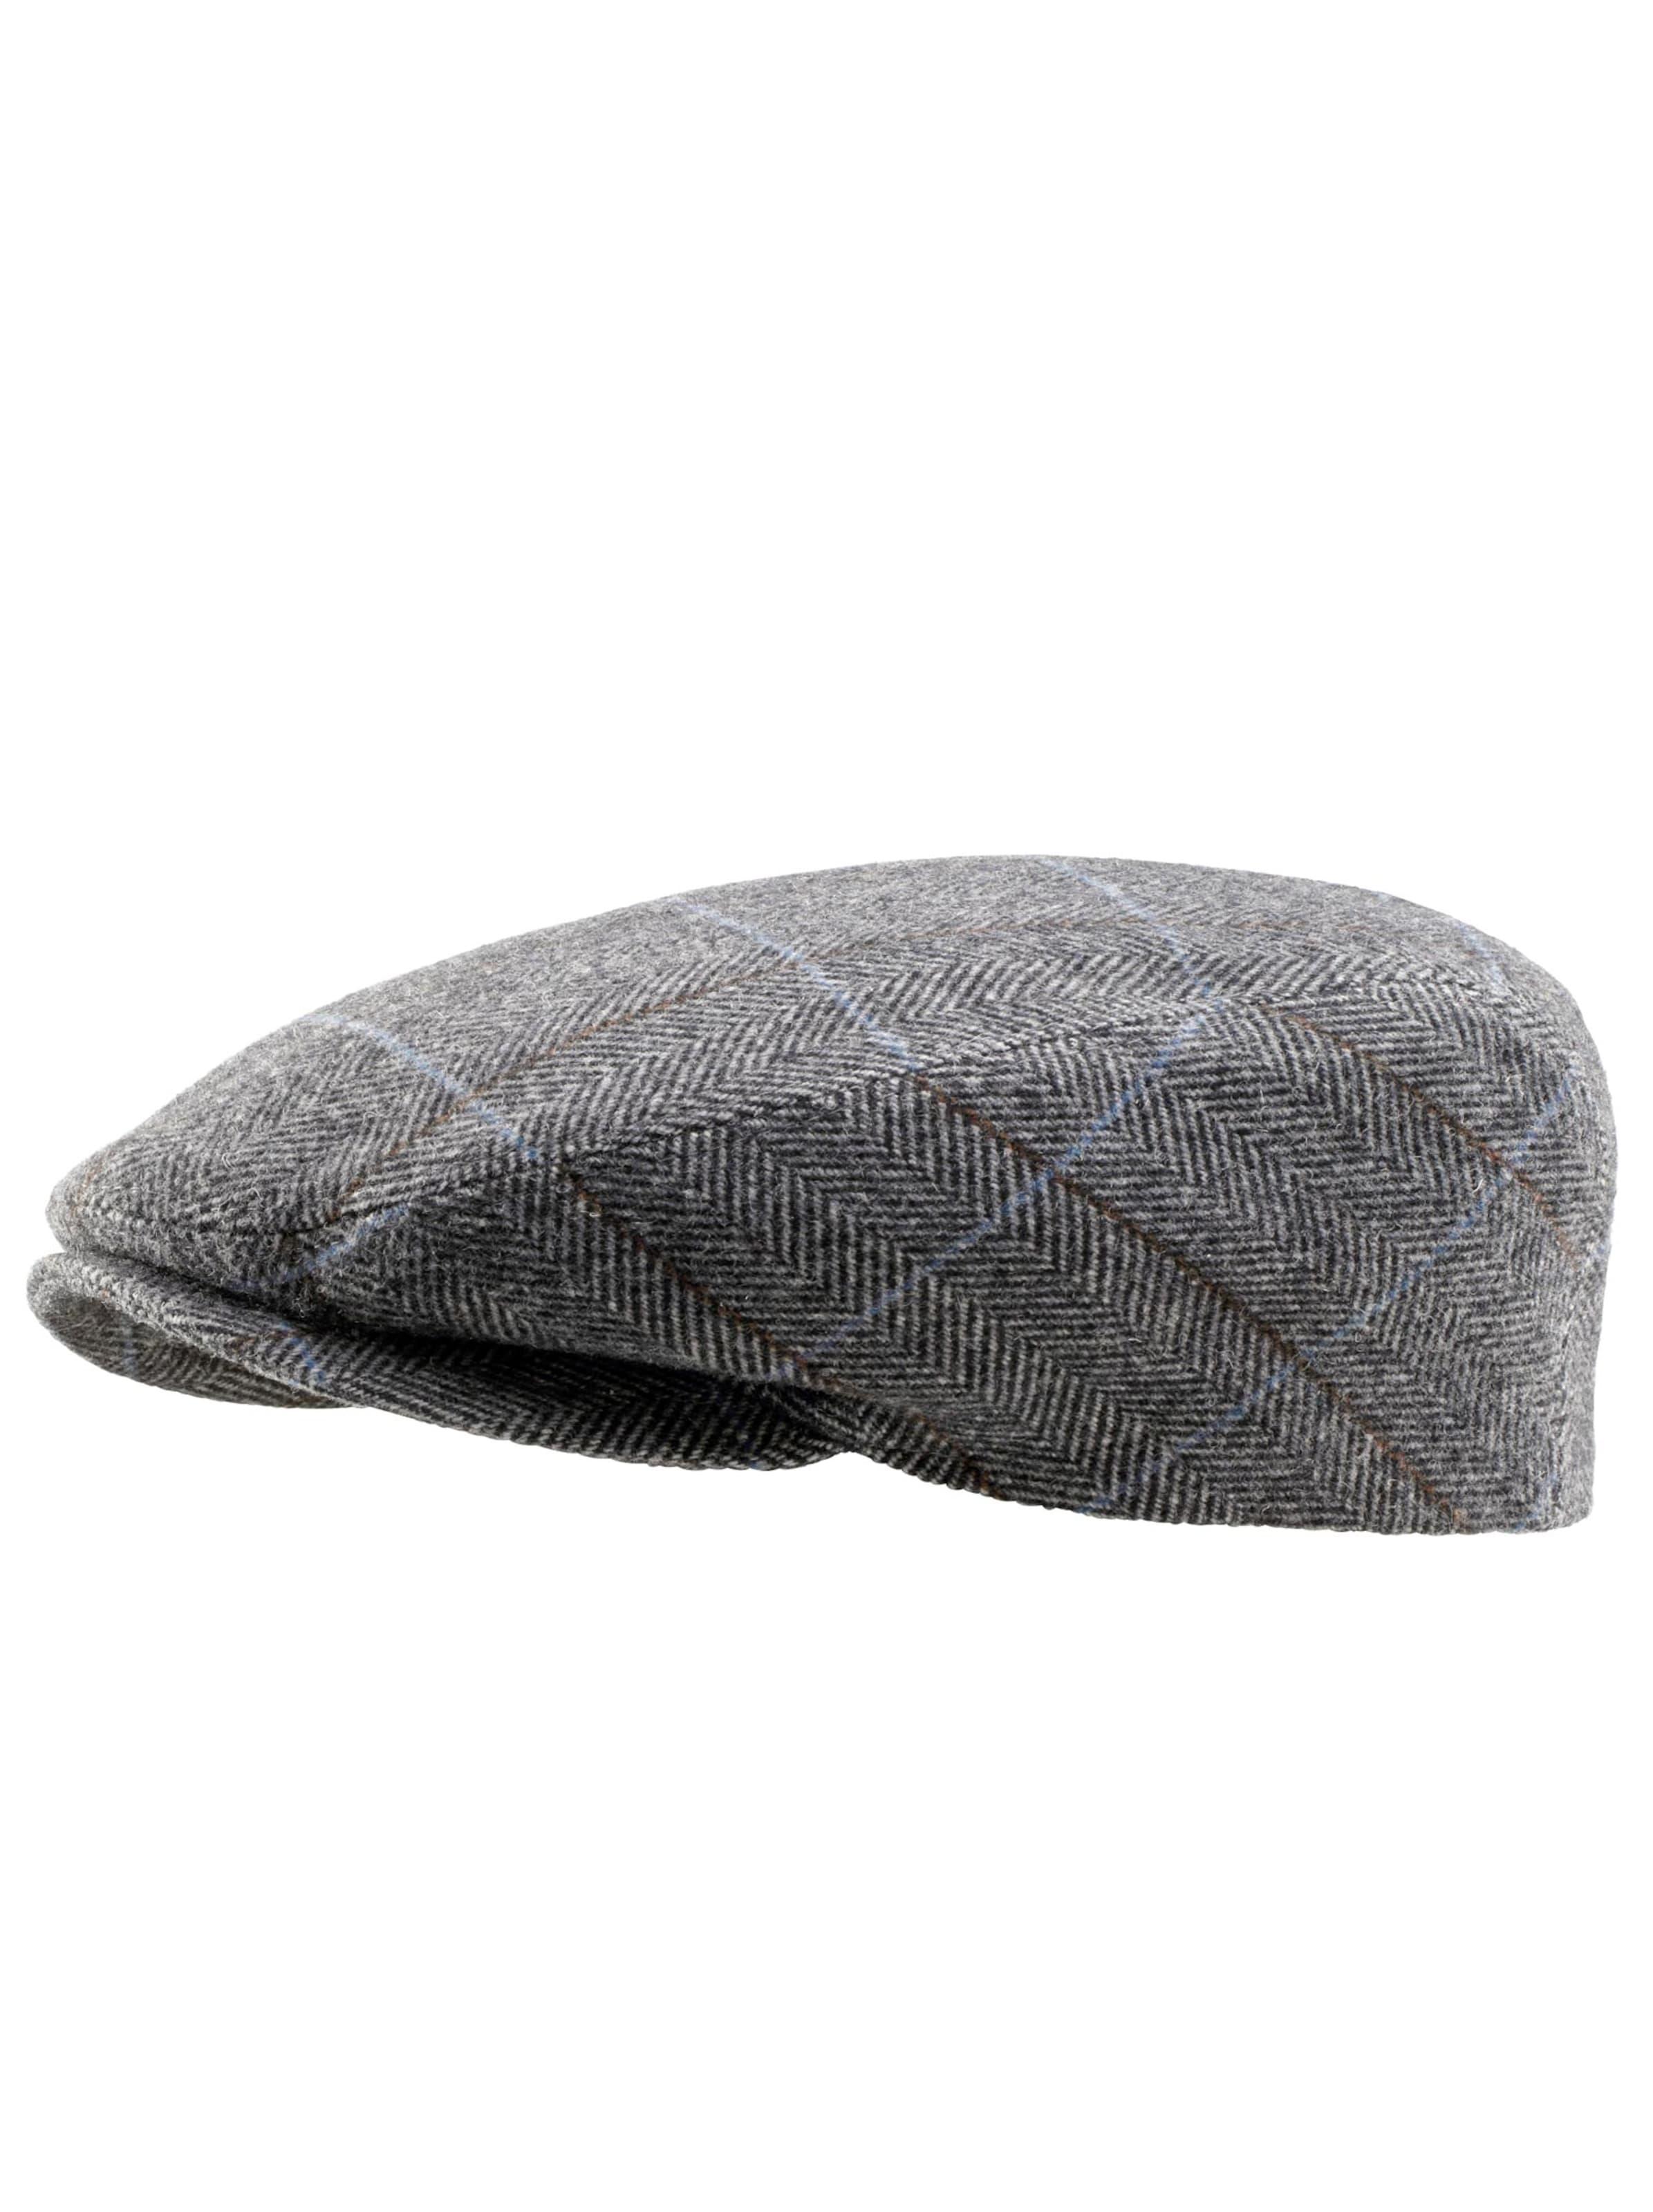 witt weiden -  Herren Mütze grau-gemustert